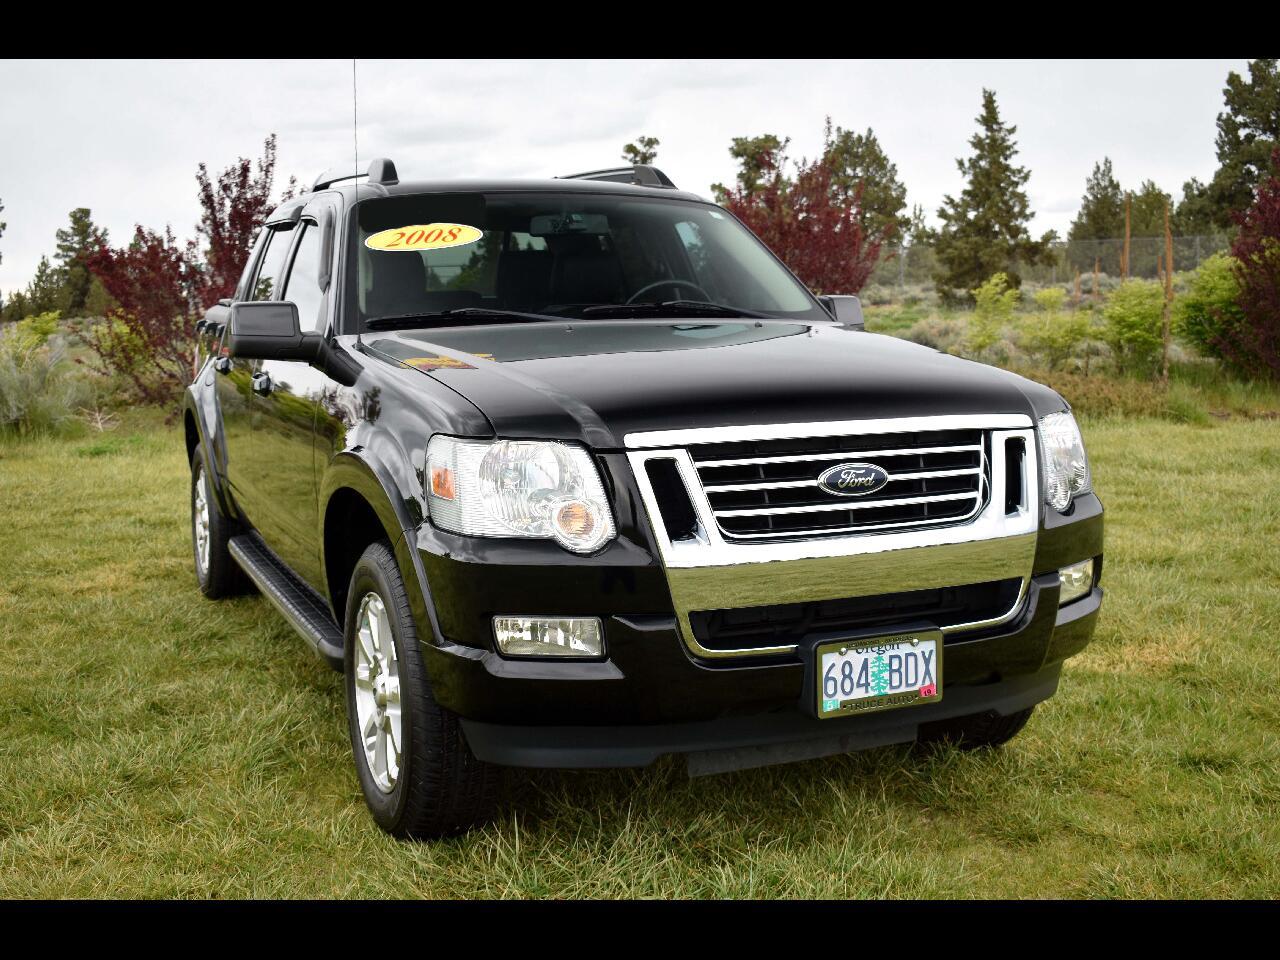 2008 Ford Explorer Sport Trac 4WD 4DR V6 LIMITED ***LOW MILES***